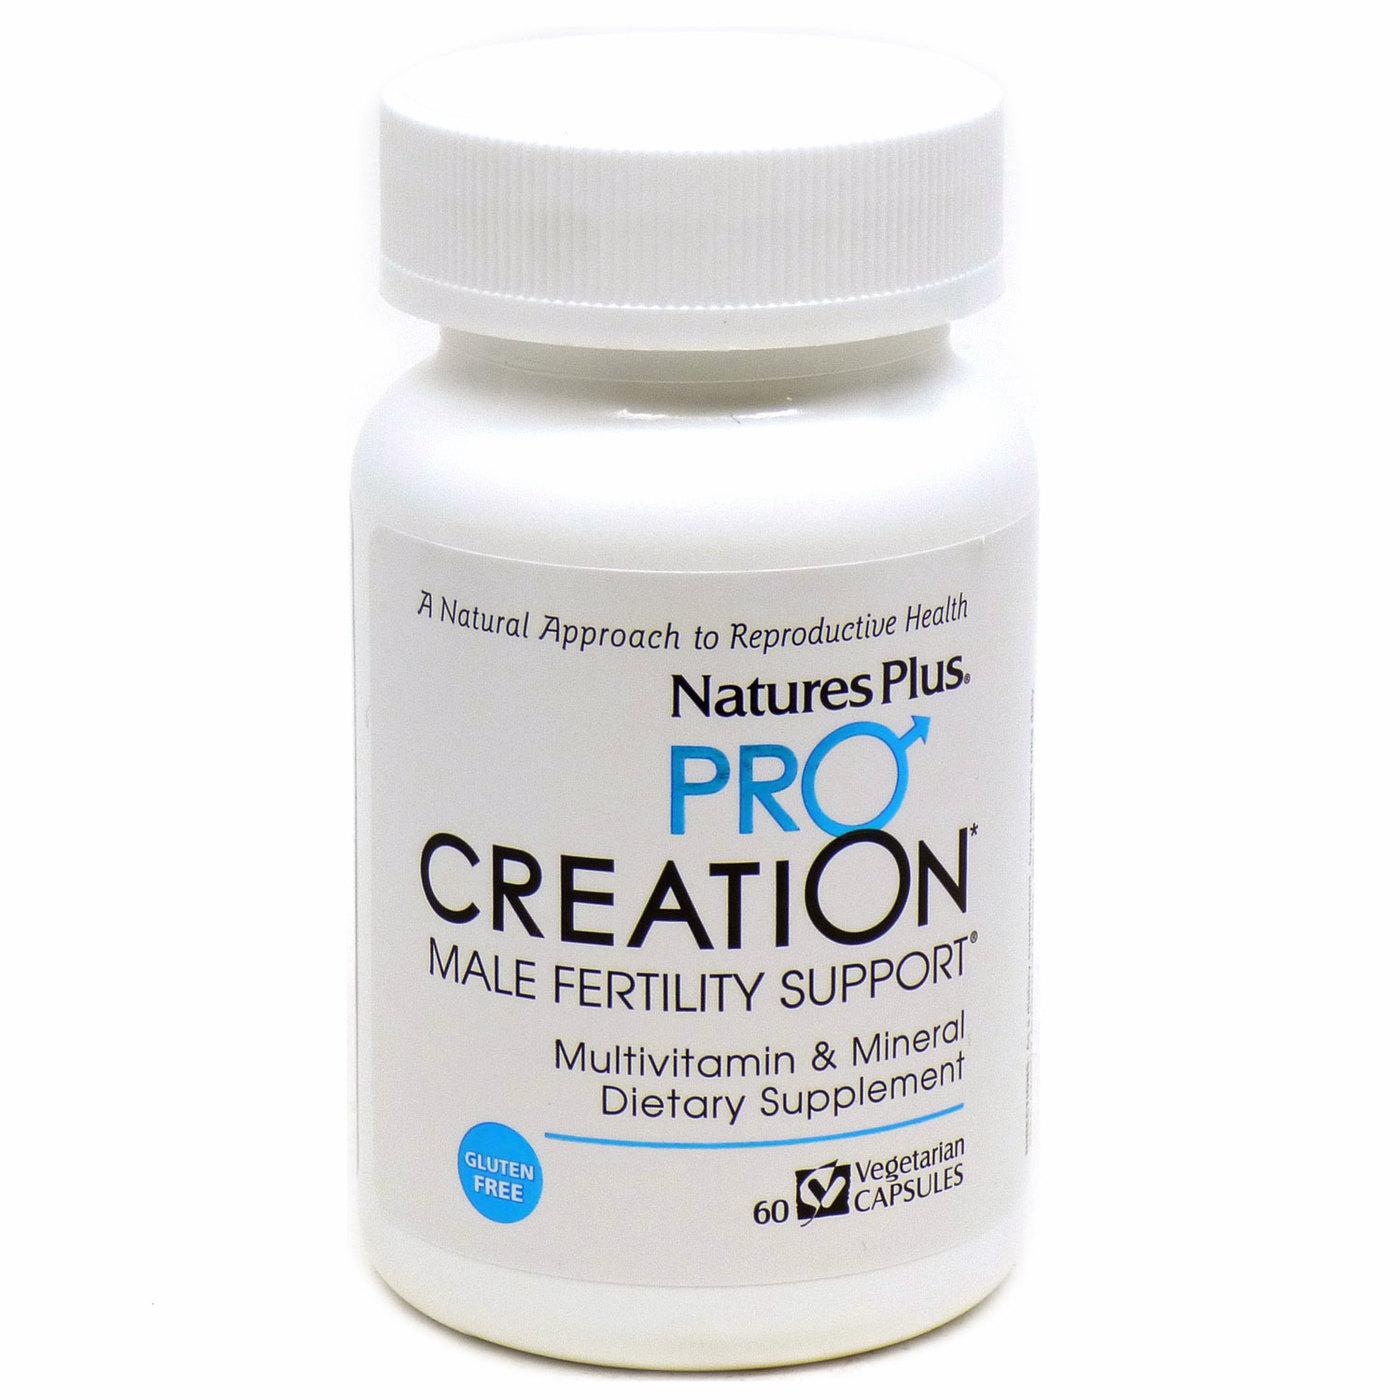 Nature S Plus Procreation Male Fertility Support Reviews